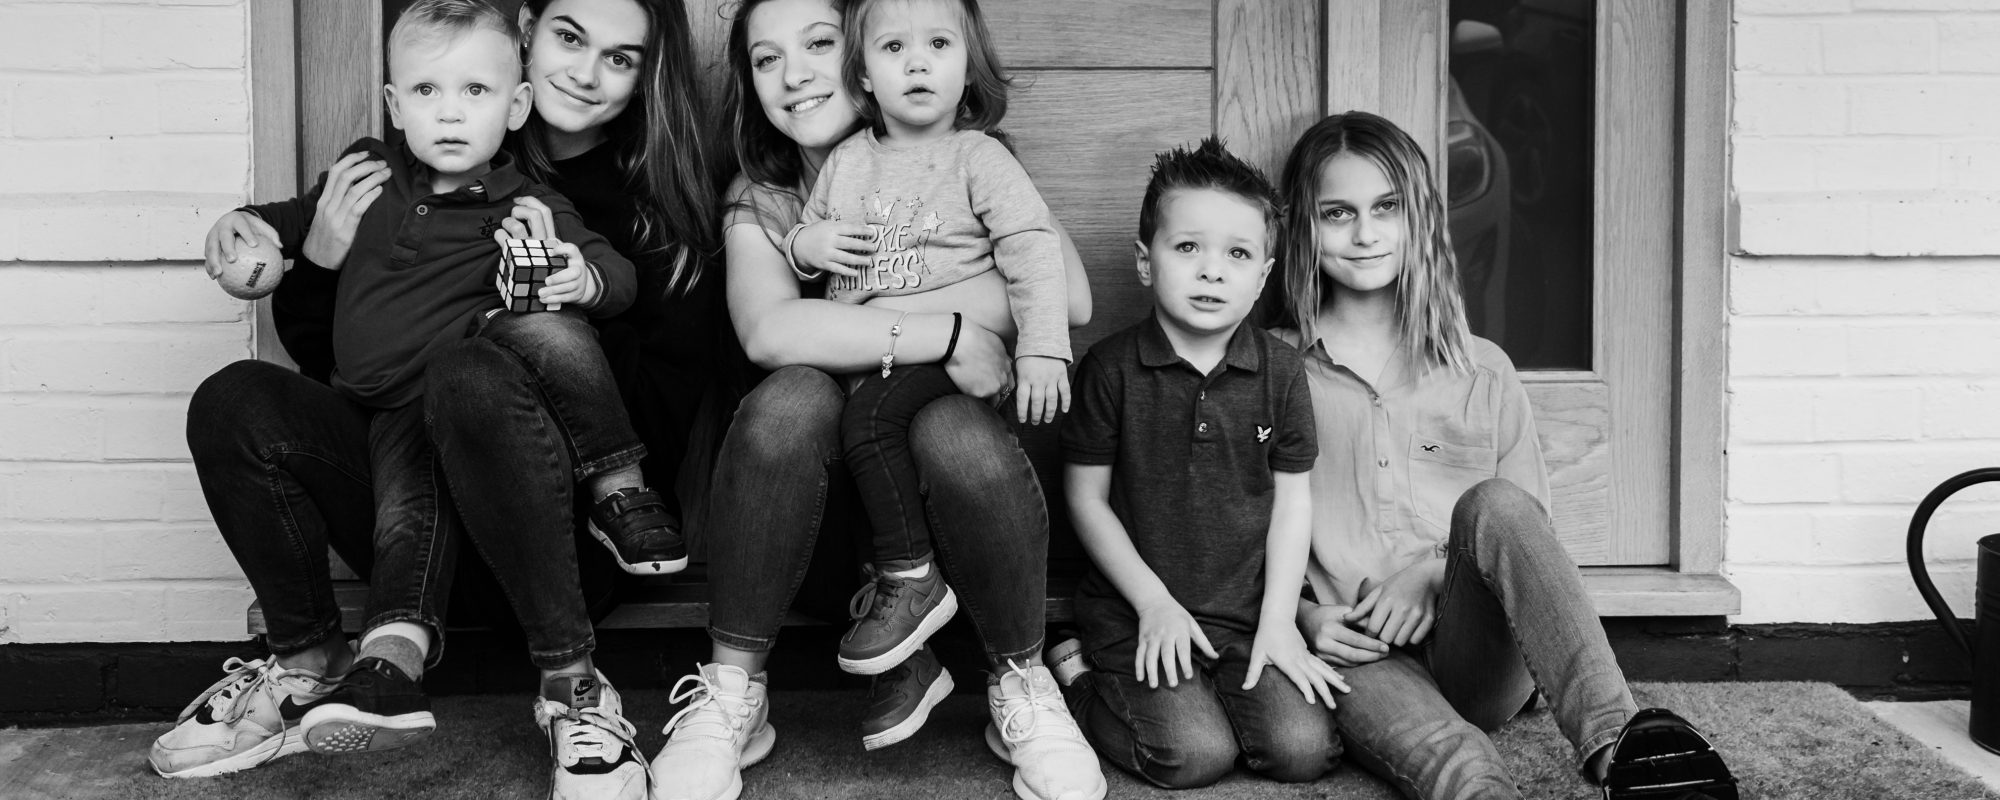 family photography esher, family photoshoot, esher, surrey,